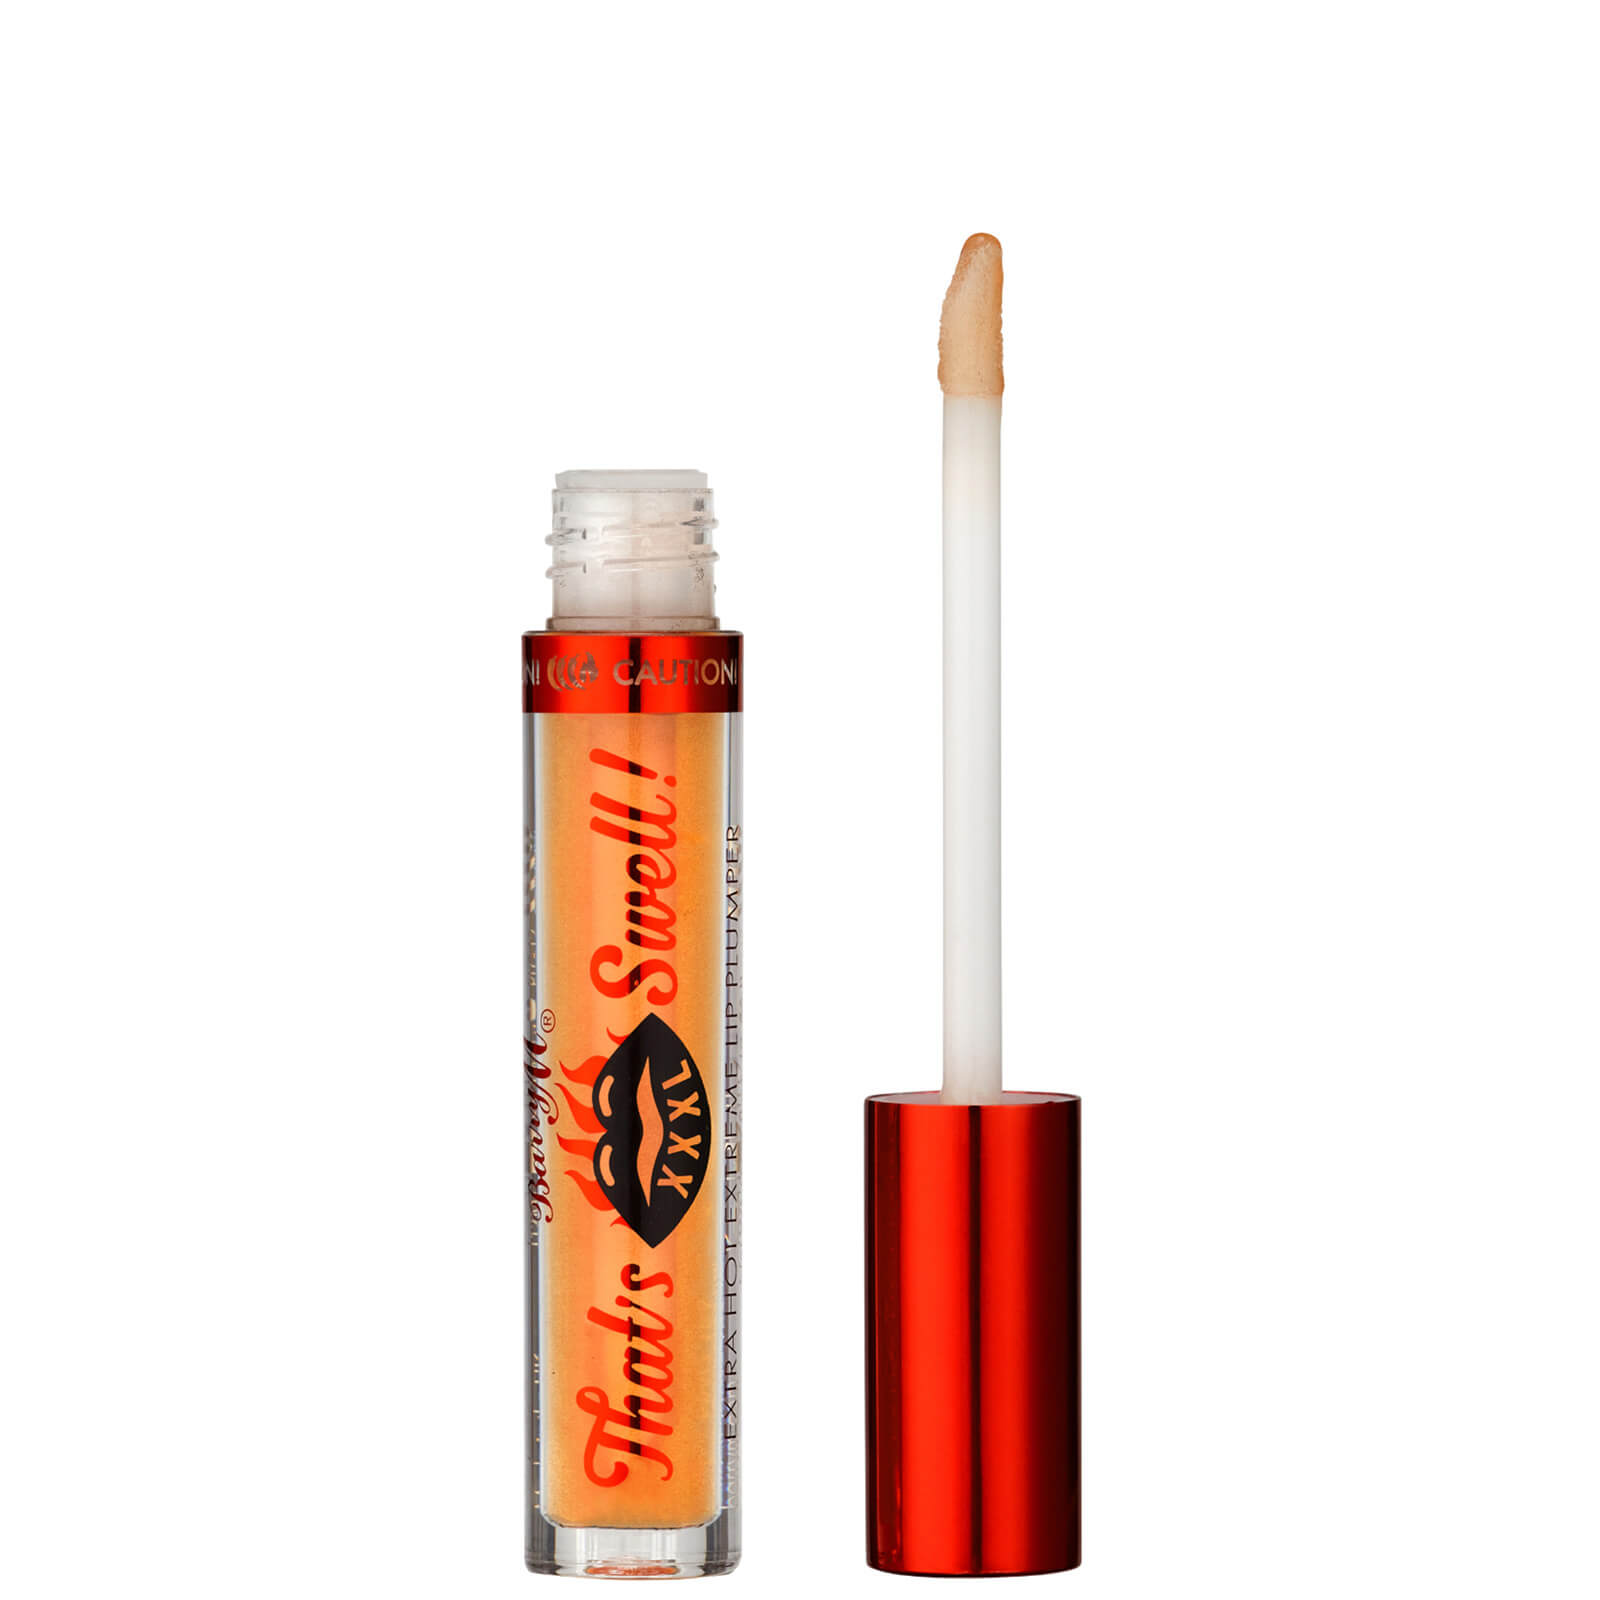 Купить Блеск для губ Barry M Cosmetics XXXL Plumping Chilli Lip Gloss 2, 5 мл